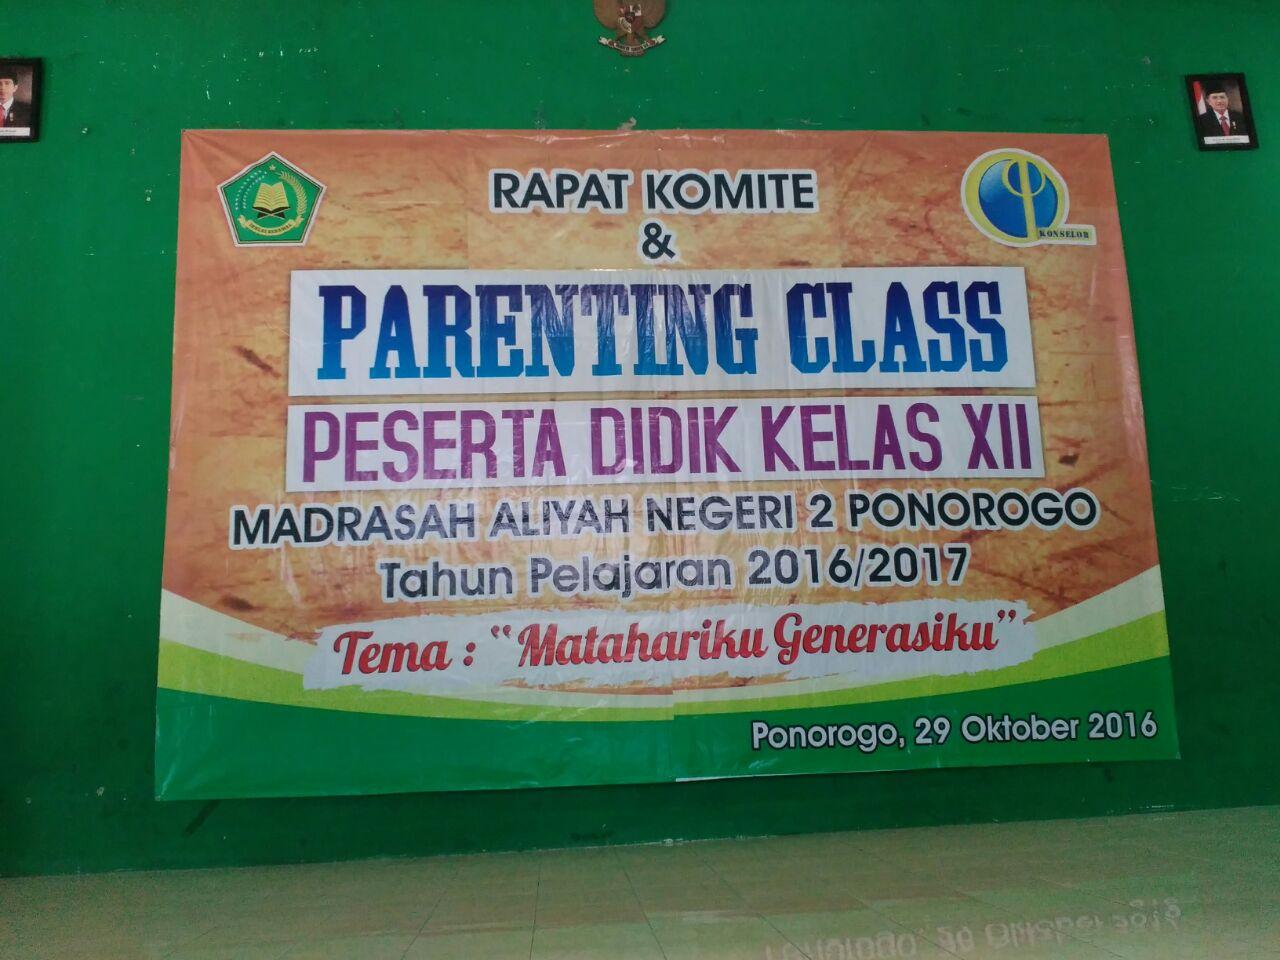 Parenting Man 2 Ponorogo